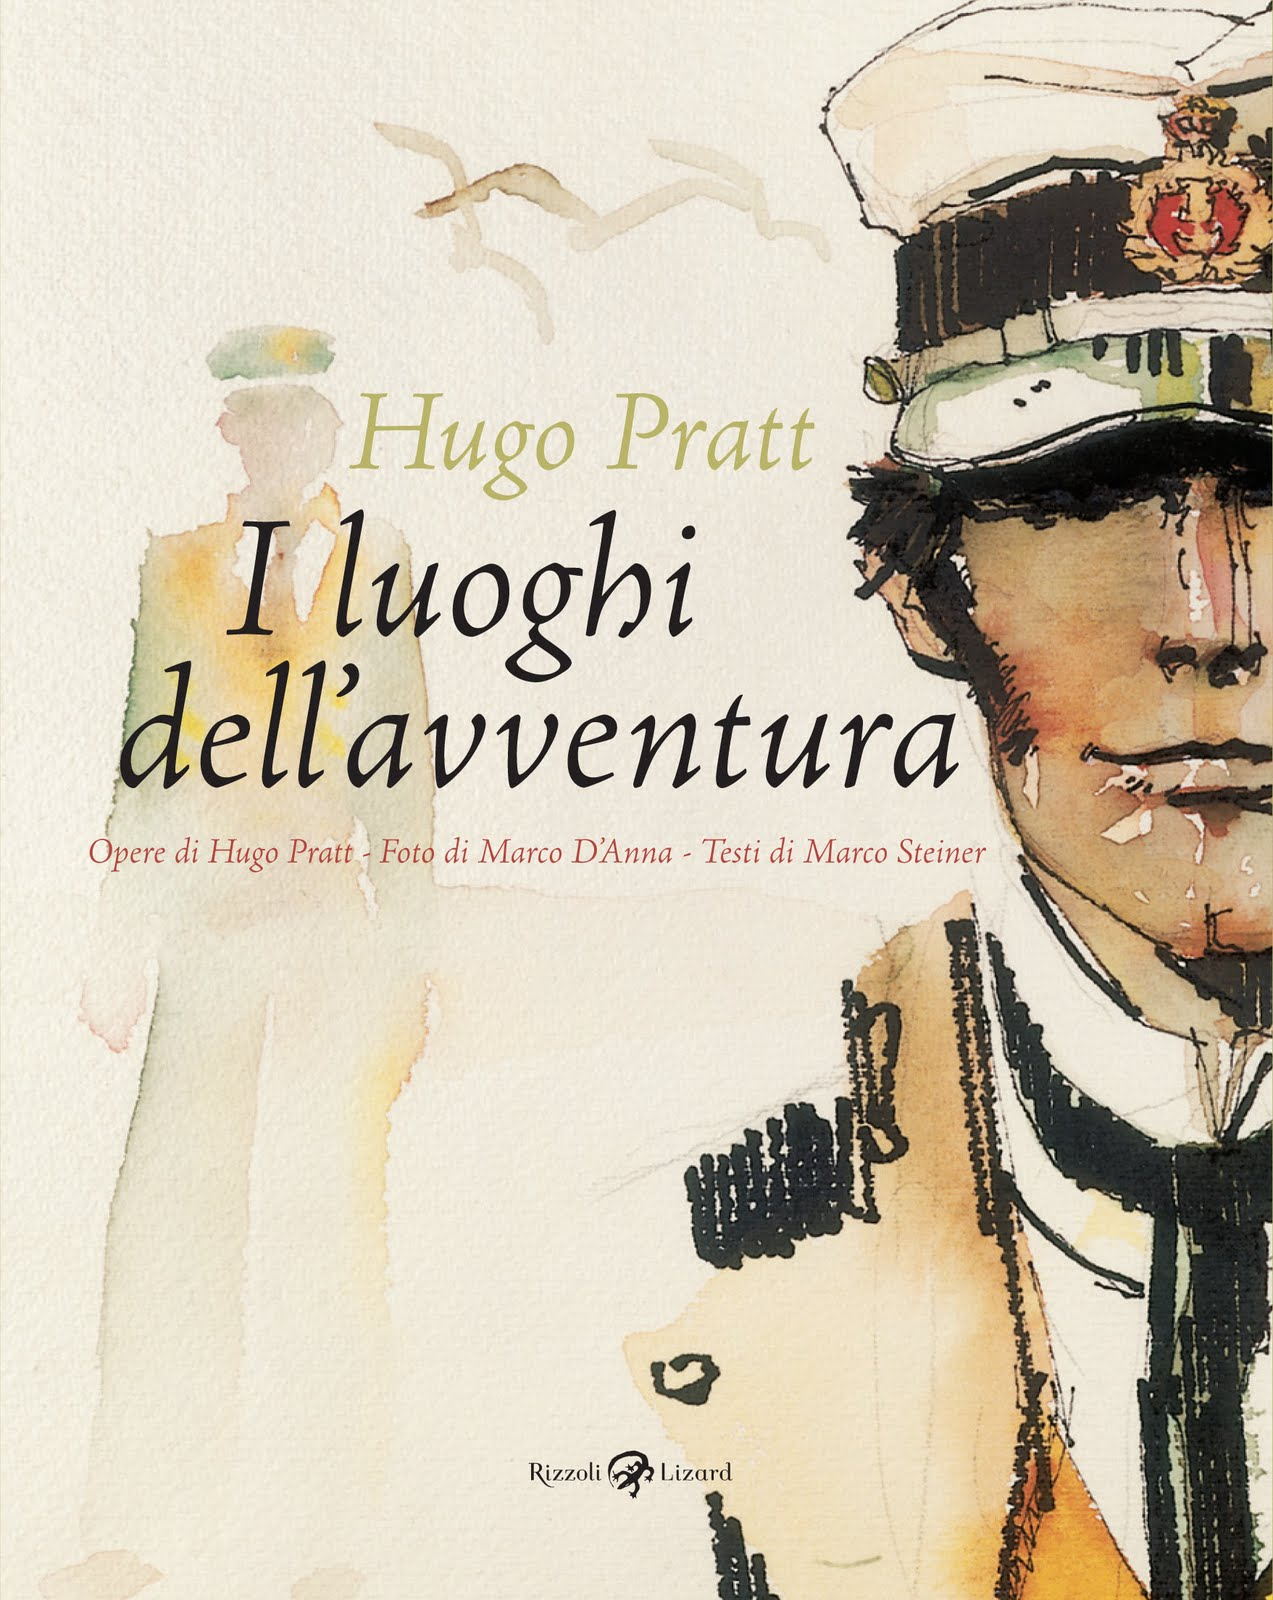 Corto Maltese Mobili Firmati Hugo Pratt : Rizzoli lizard hugo pratt i luoghi dell avventura